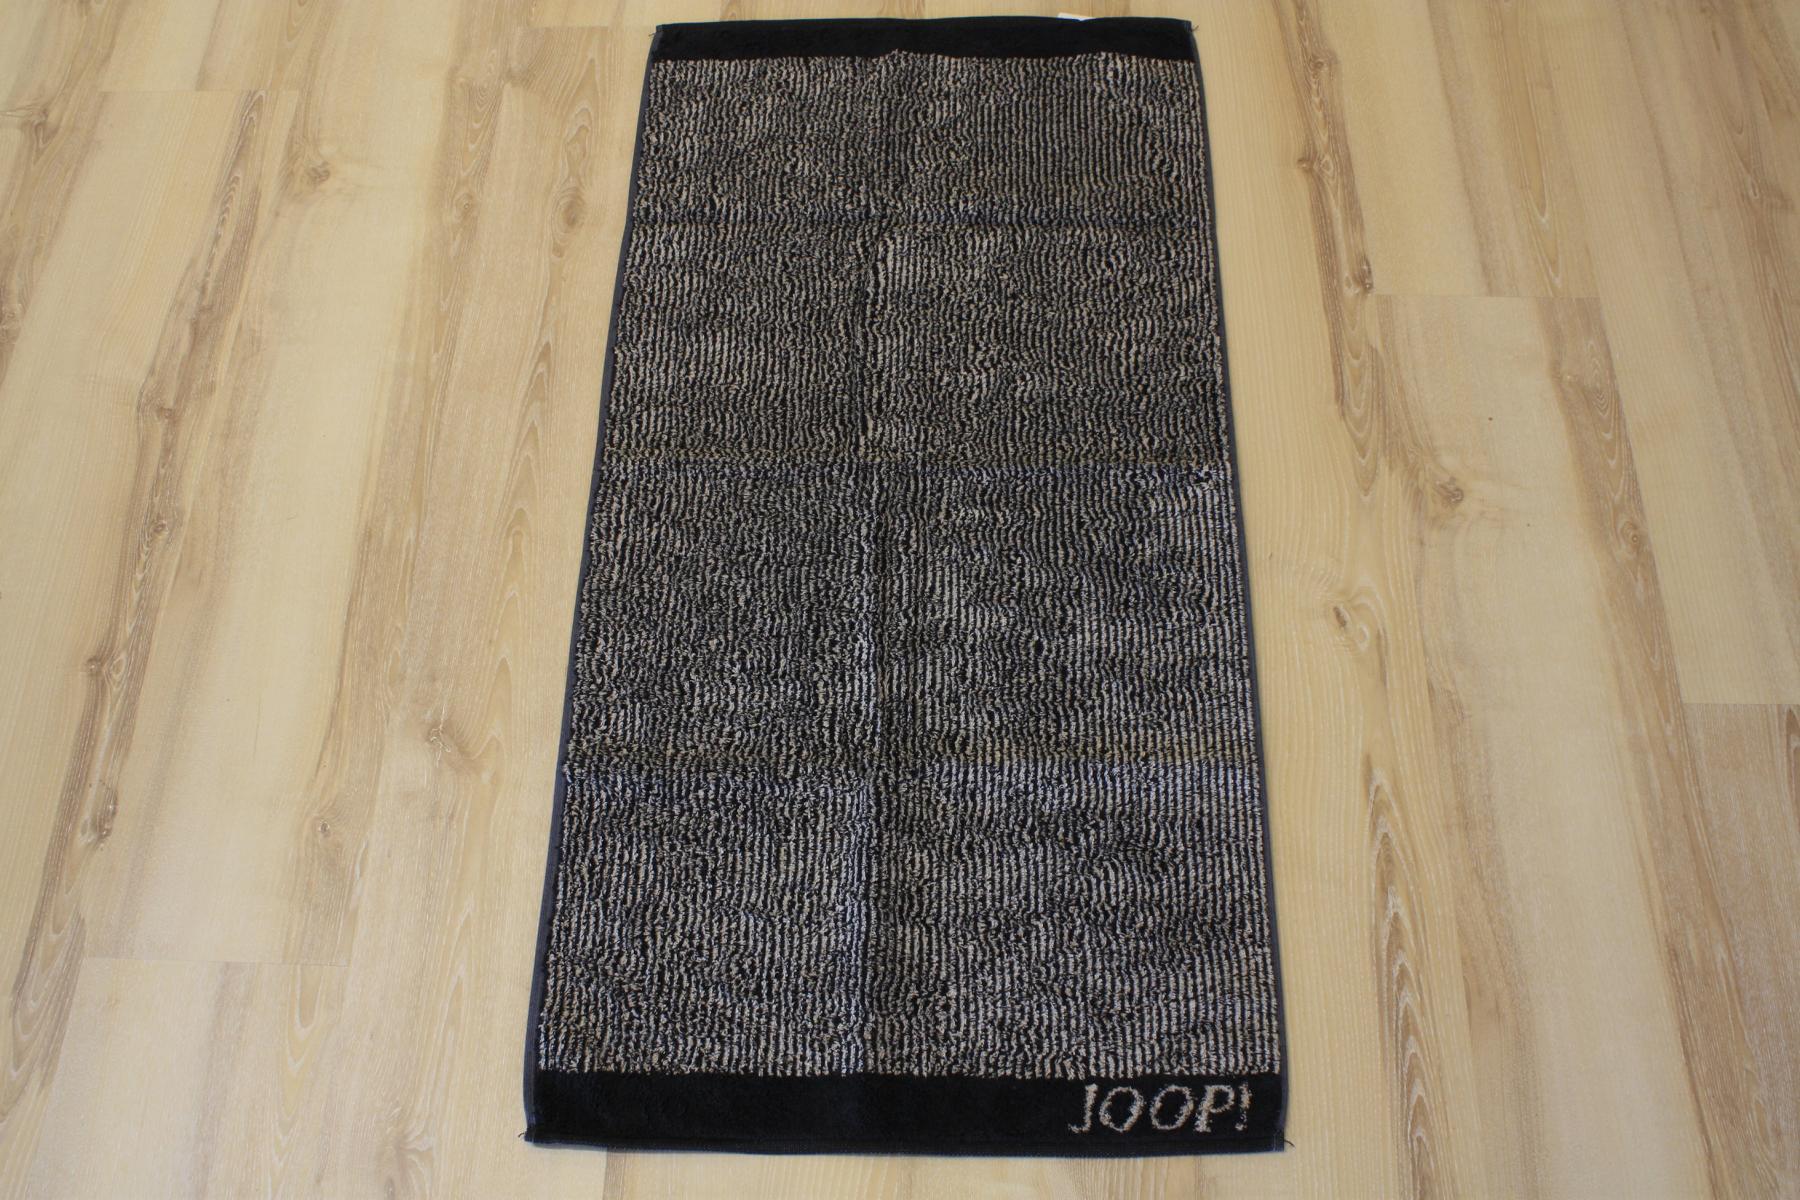 joop duschtuch badetuch 1652 stripes 93 schwarz 80x150cm. Black Bedroom Furniture Sets. Home Design Ideas